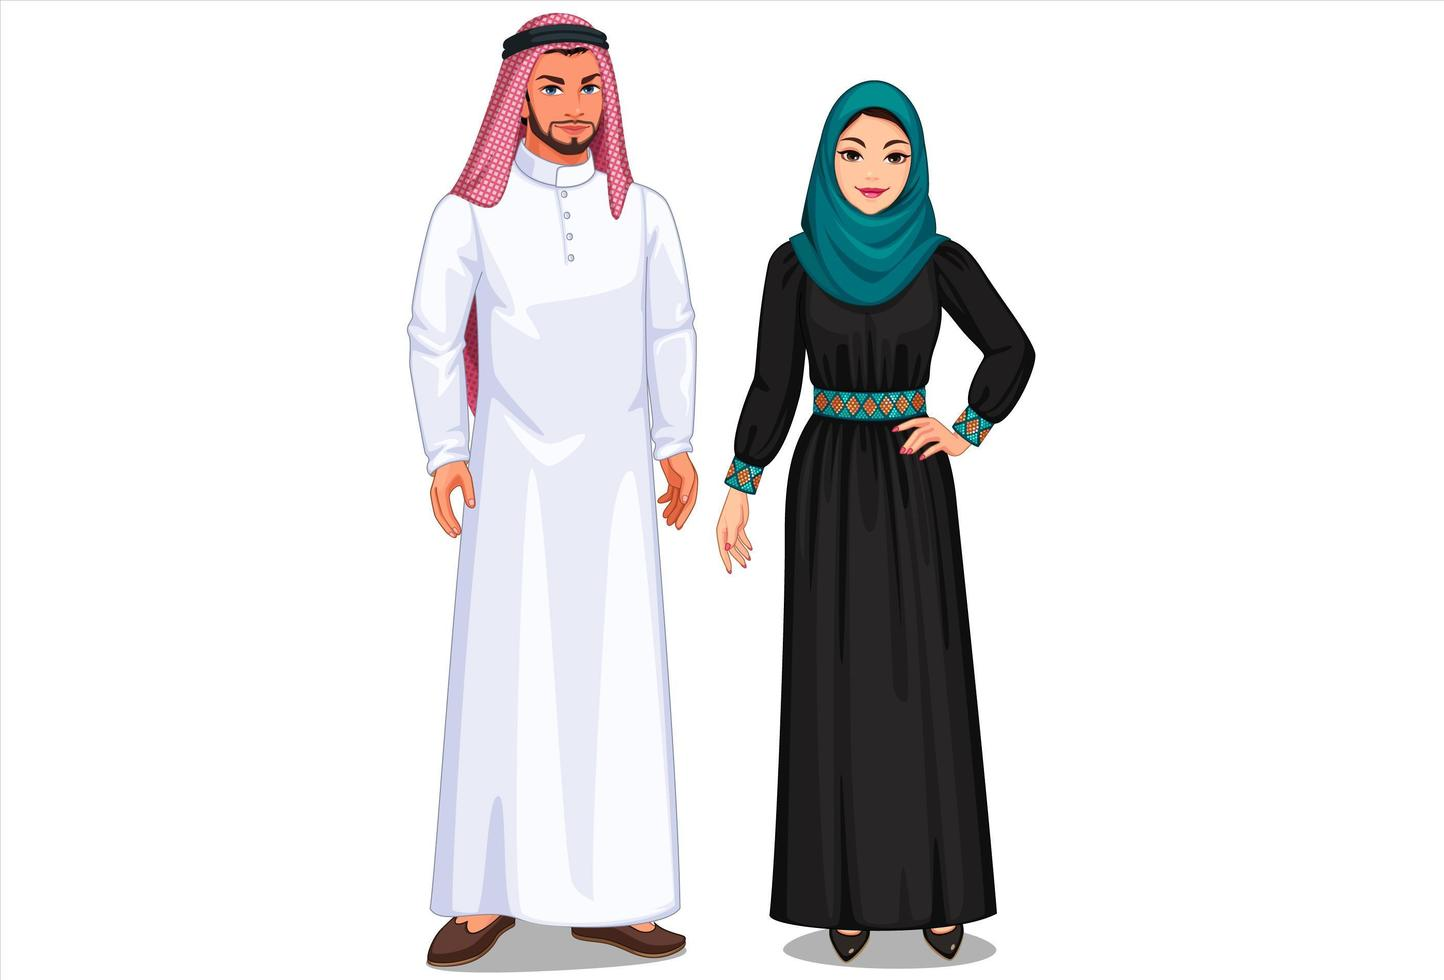 casal feliz do Oriente Médio em pé vetor